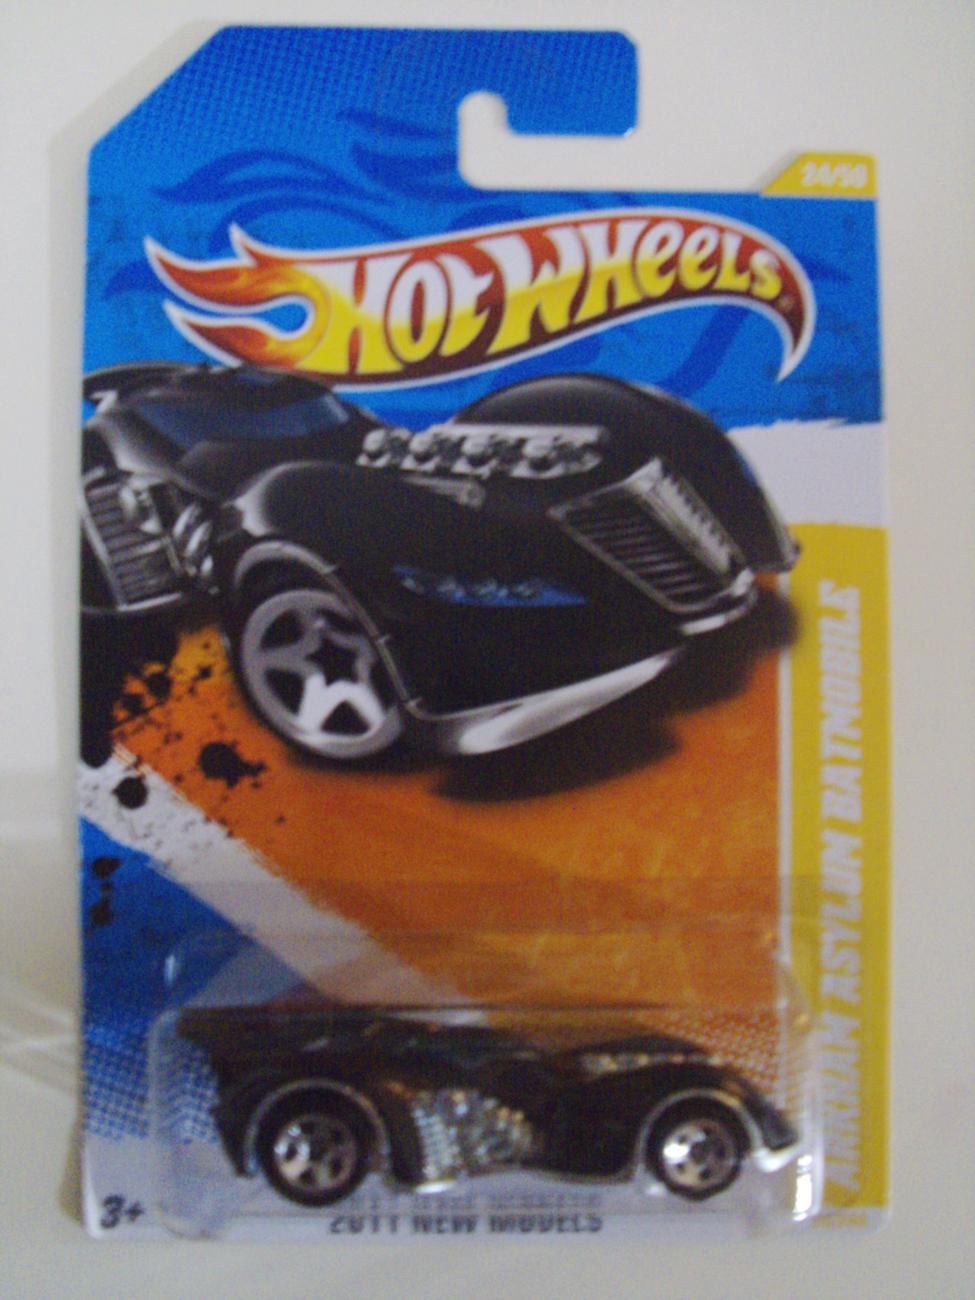 2011 New Models Hot Wheels Batman Arkham Asylum Batmobile car 24/50 - New